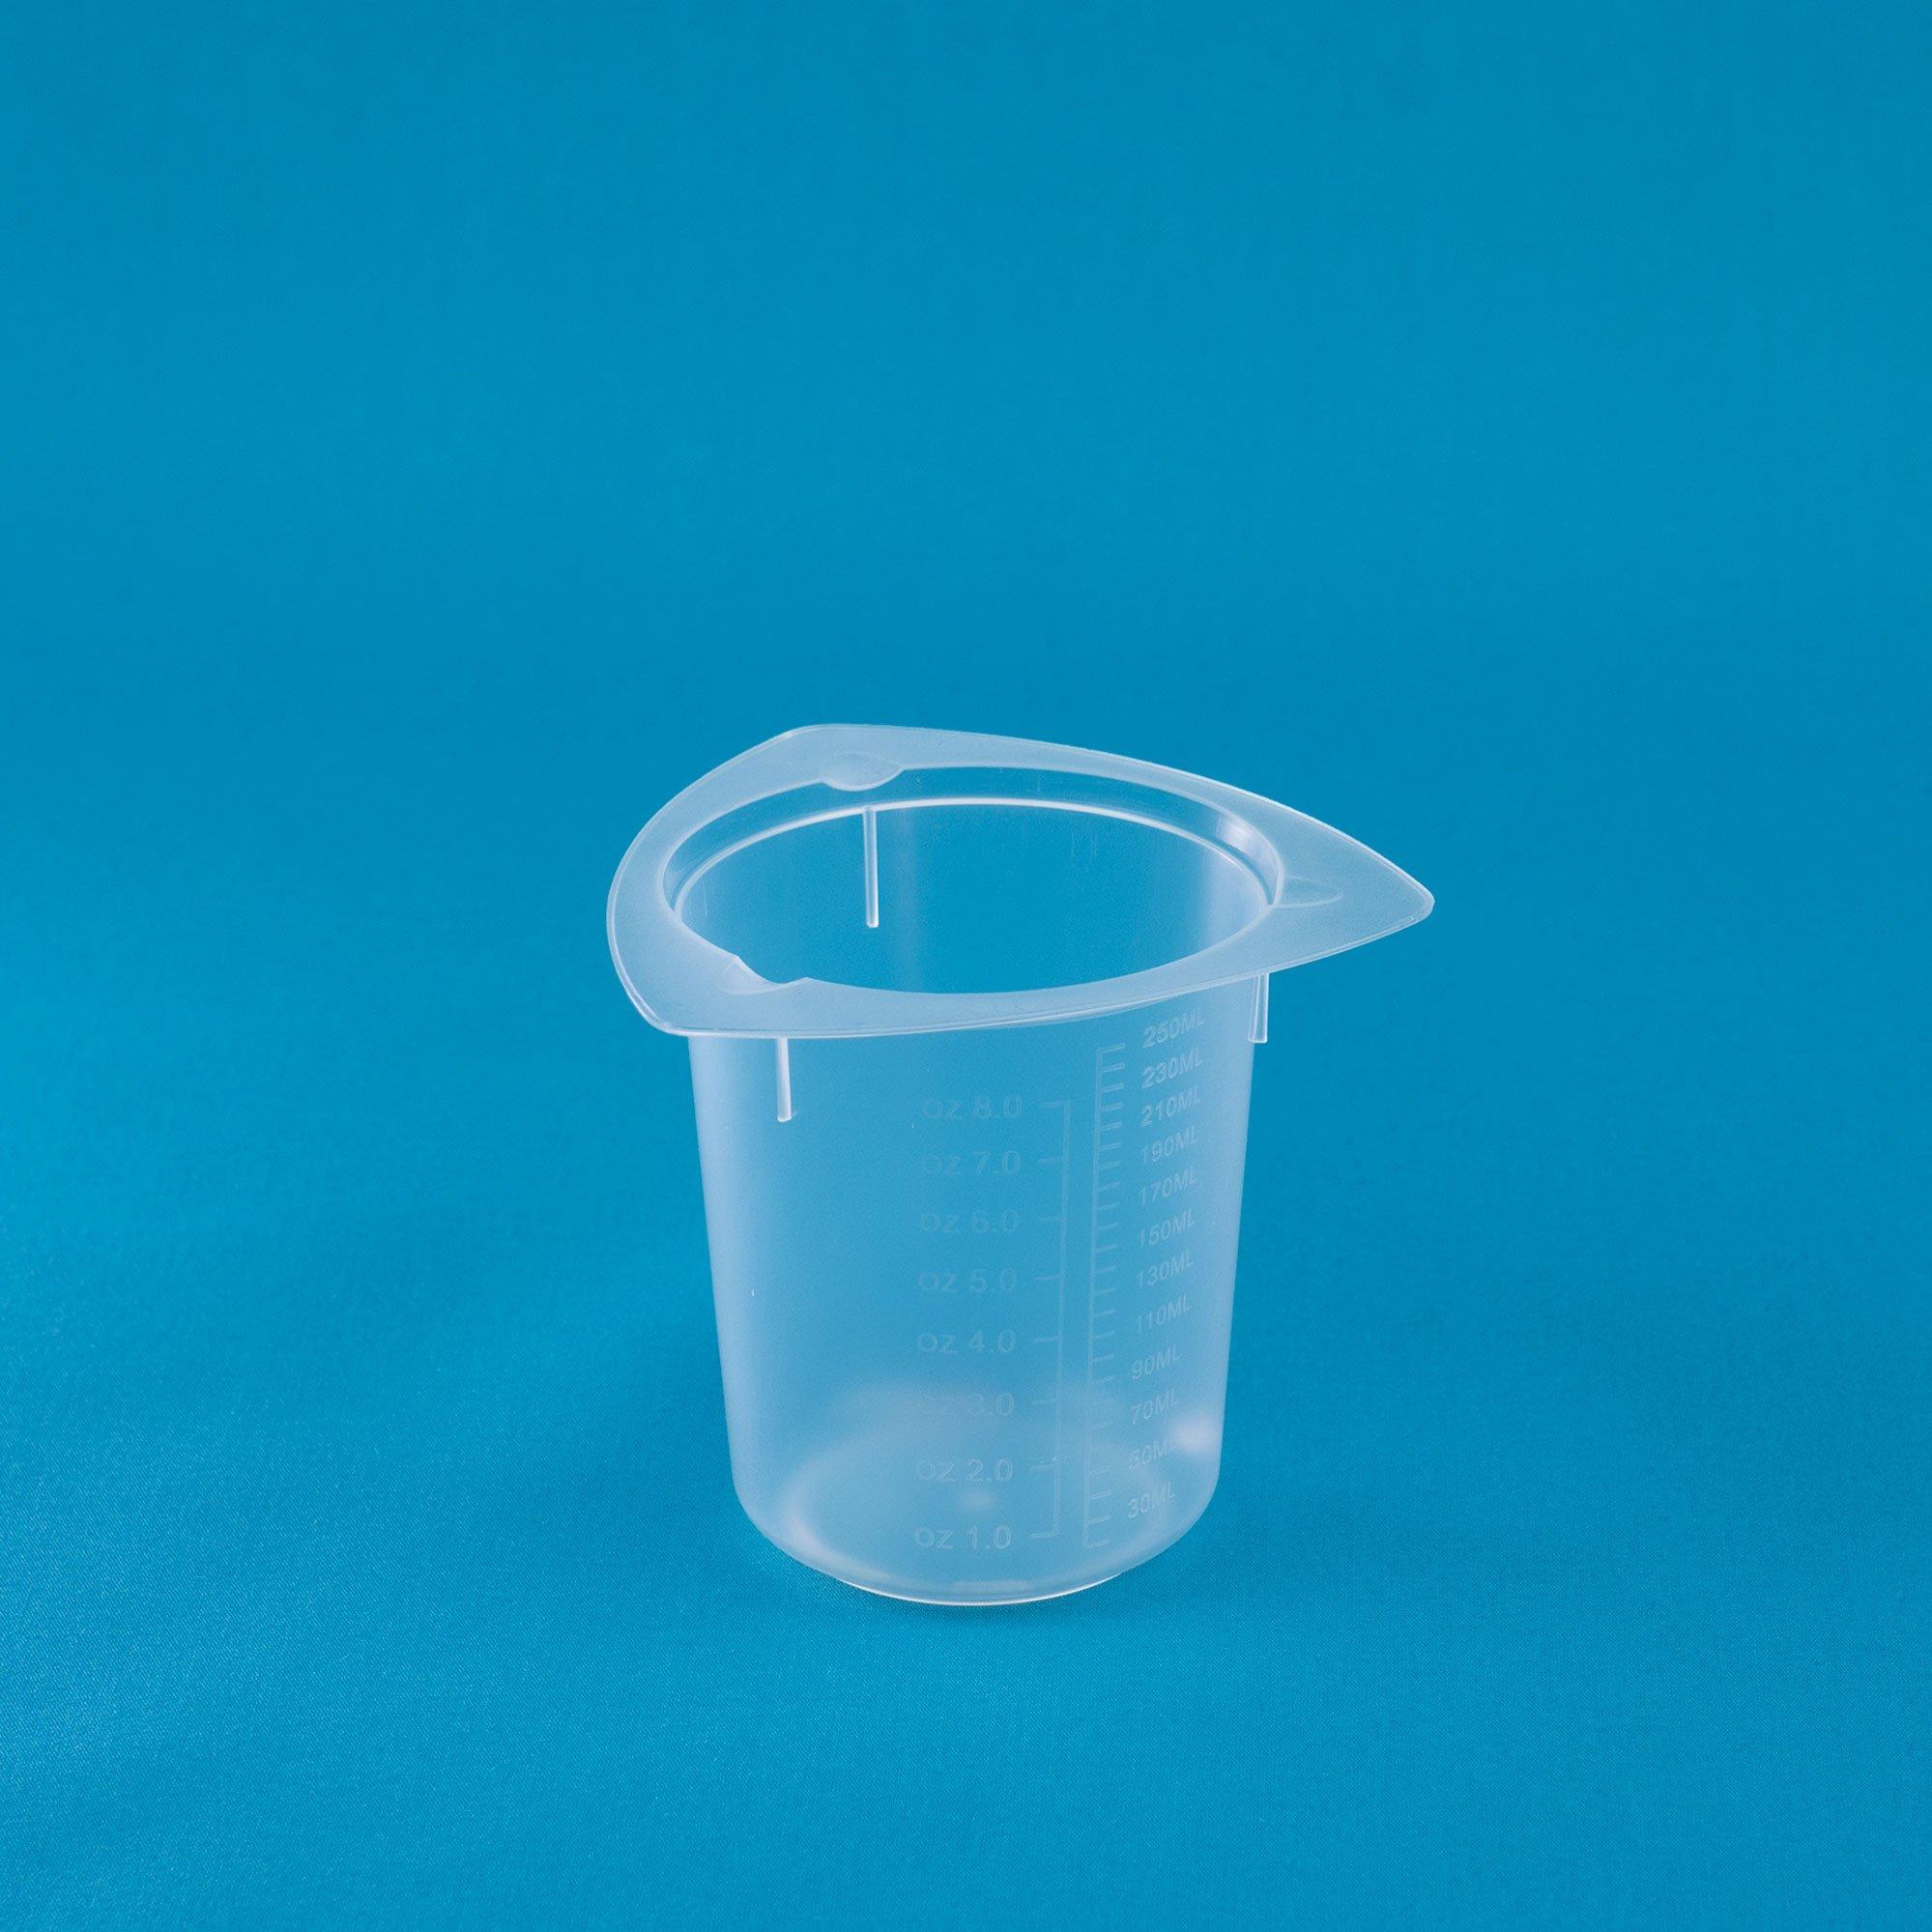 United Scientific BTC0250 Polypropylene Tri-Corner Beaker, 250ml Capacity, 20ml Graduation Interval (Case of 100)